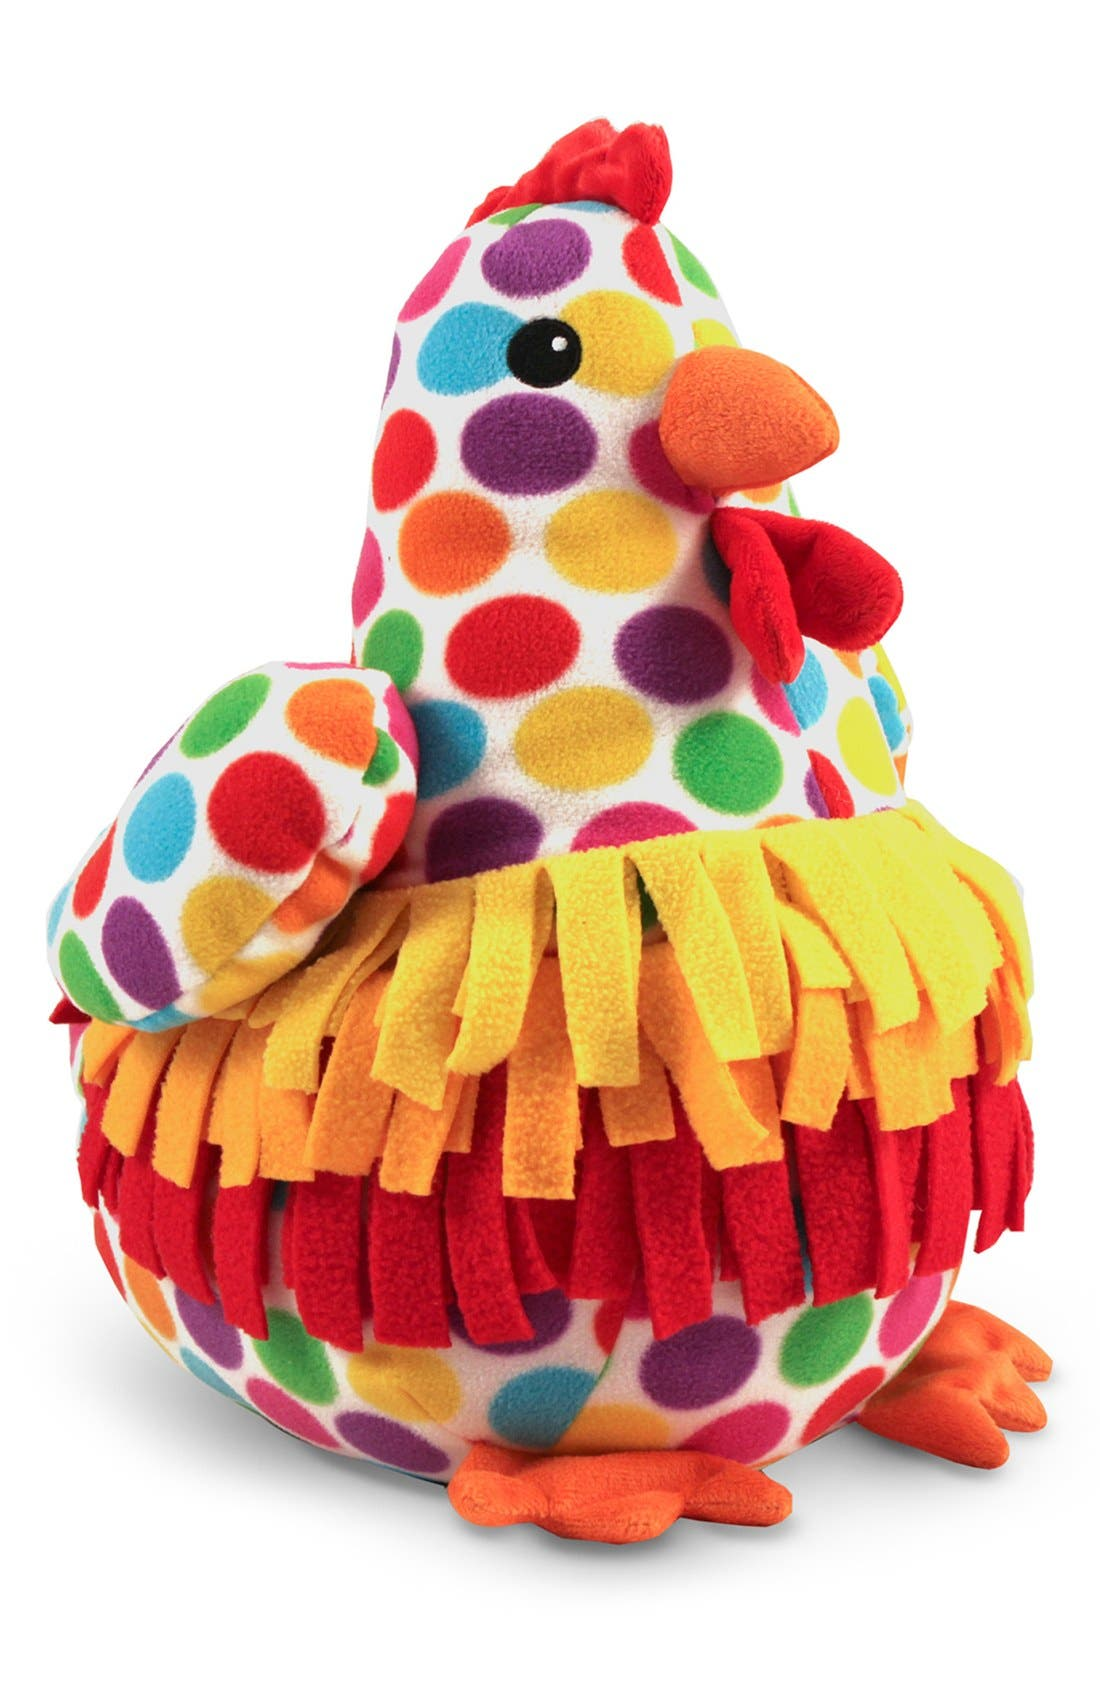 Melissa & Doug 'Beeposh -Dotty Chicken' Plush Toy